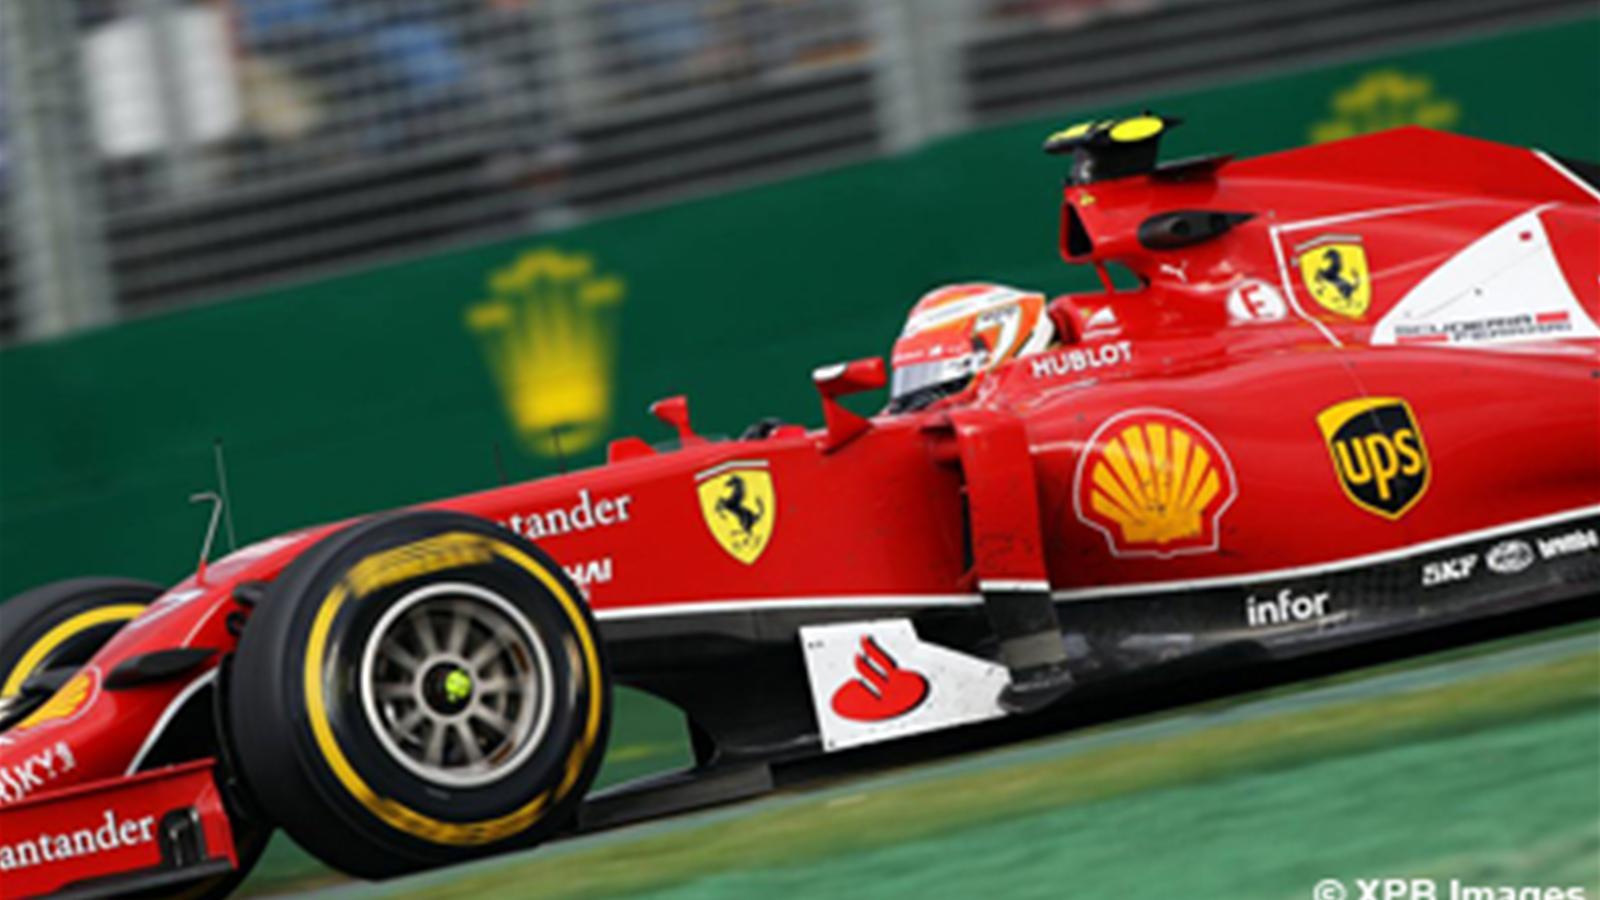 Ferrari manque de vitesse de pointe grand prix d 39 australie 2014 formule 1 eurosport - Formule vitesse de coupe ...